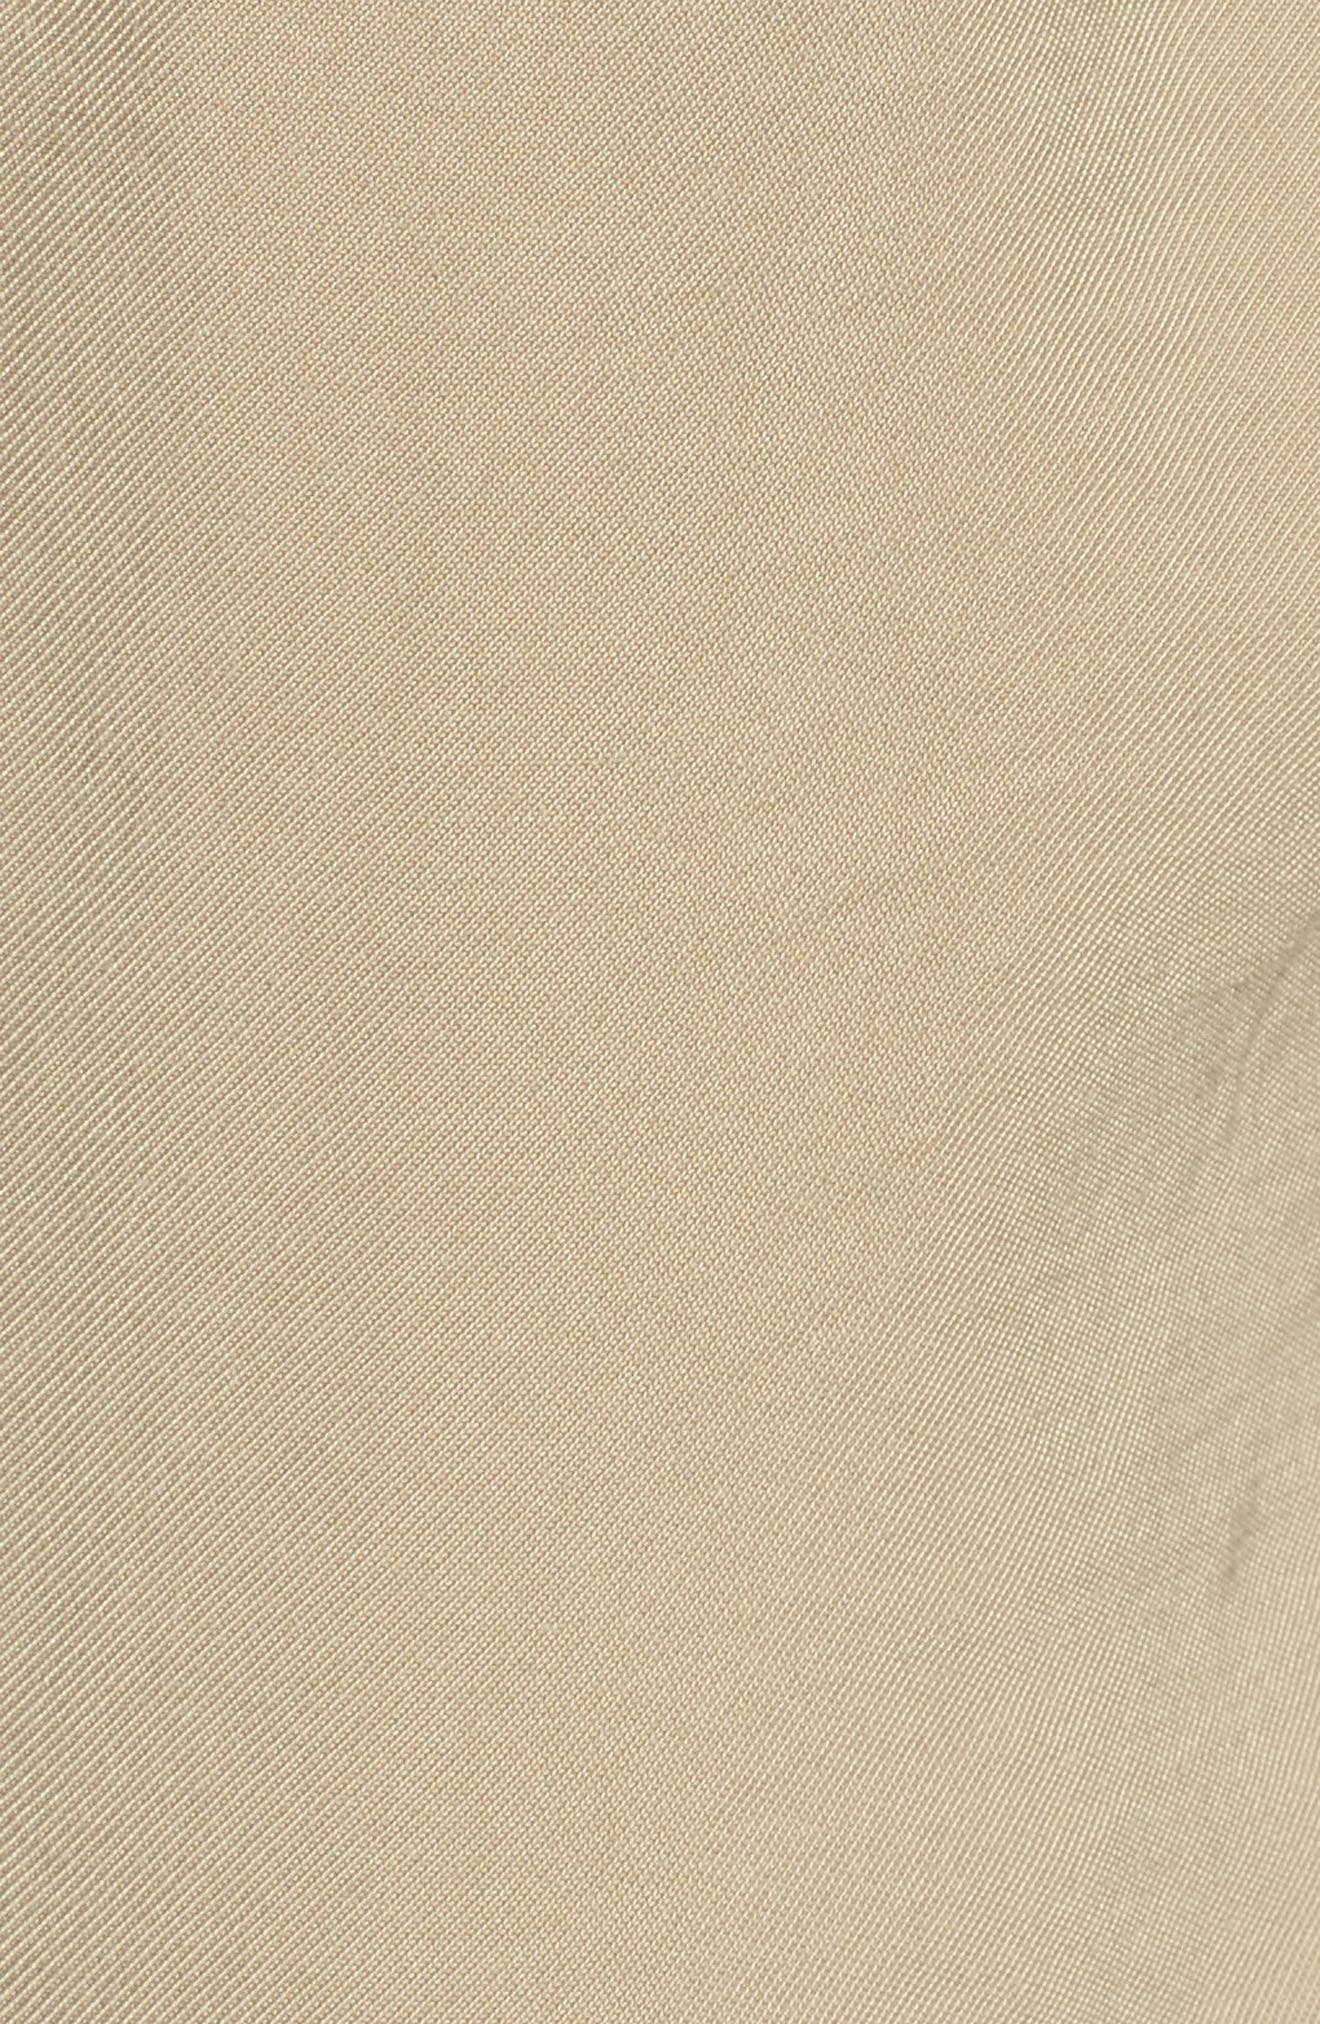 High Waist Tie Front Cropped Pants,                             Alternate thumbnail 5, color,                             Latte